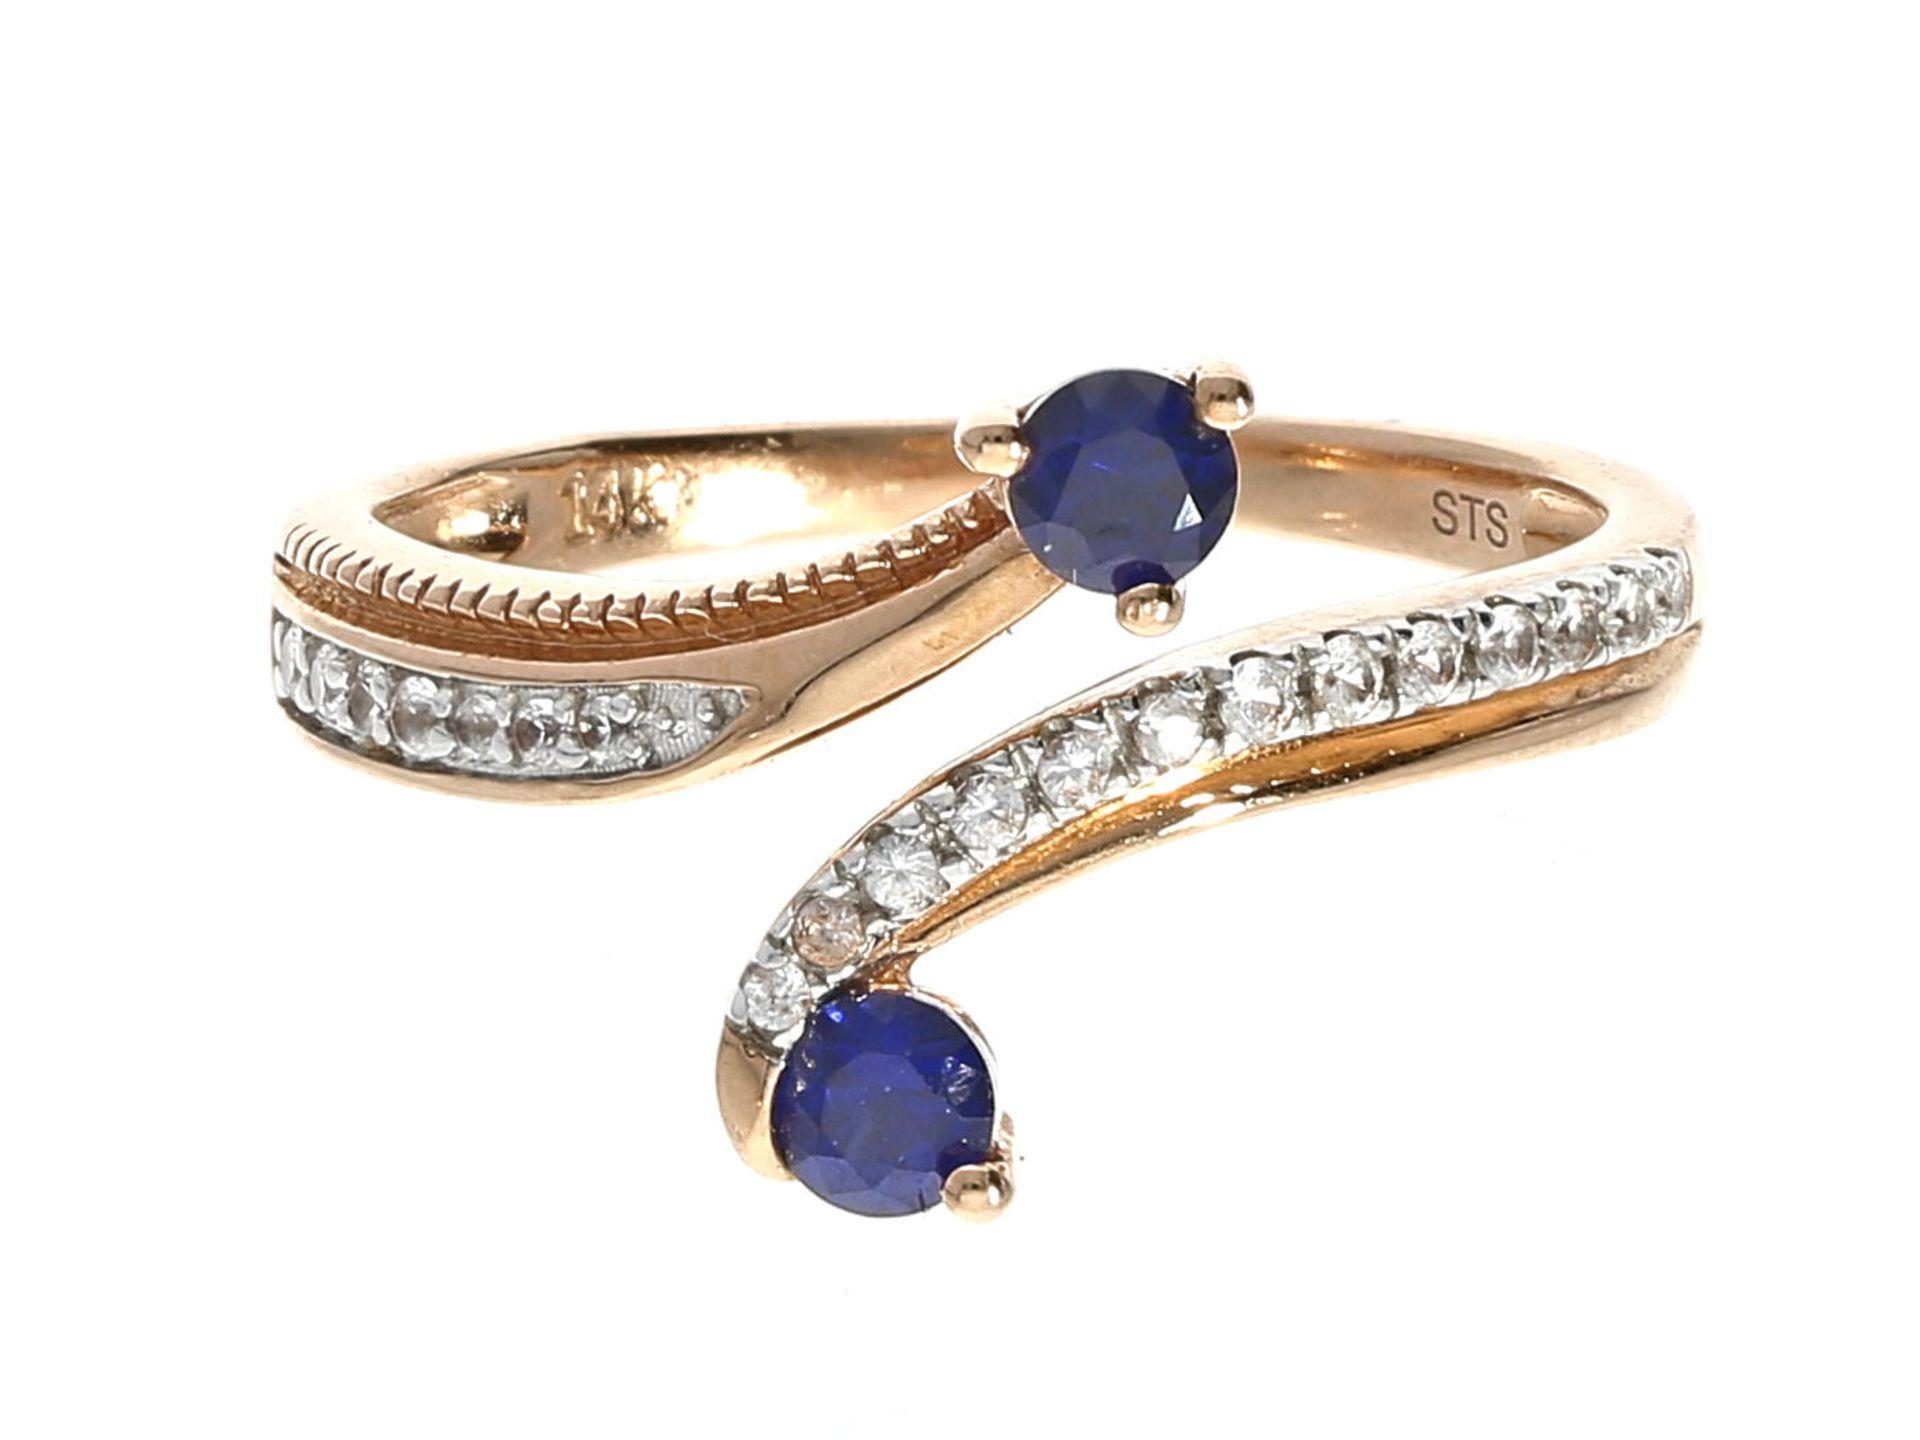 Los 6038 - Ring: ausgefallener Saphirring, Rotgold Ca. Ø17mm, RG53, ca. 2,5g, 10K Rotgold, 2 sehr schöne